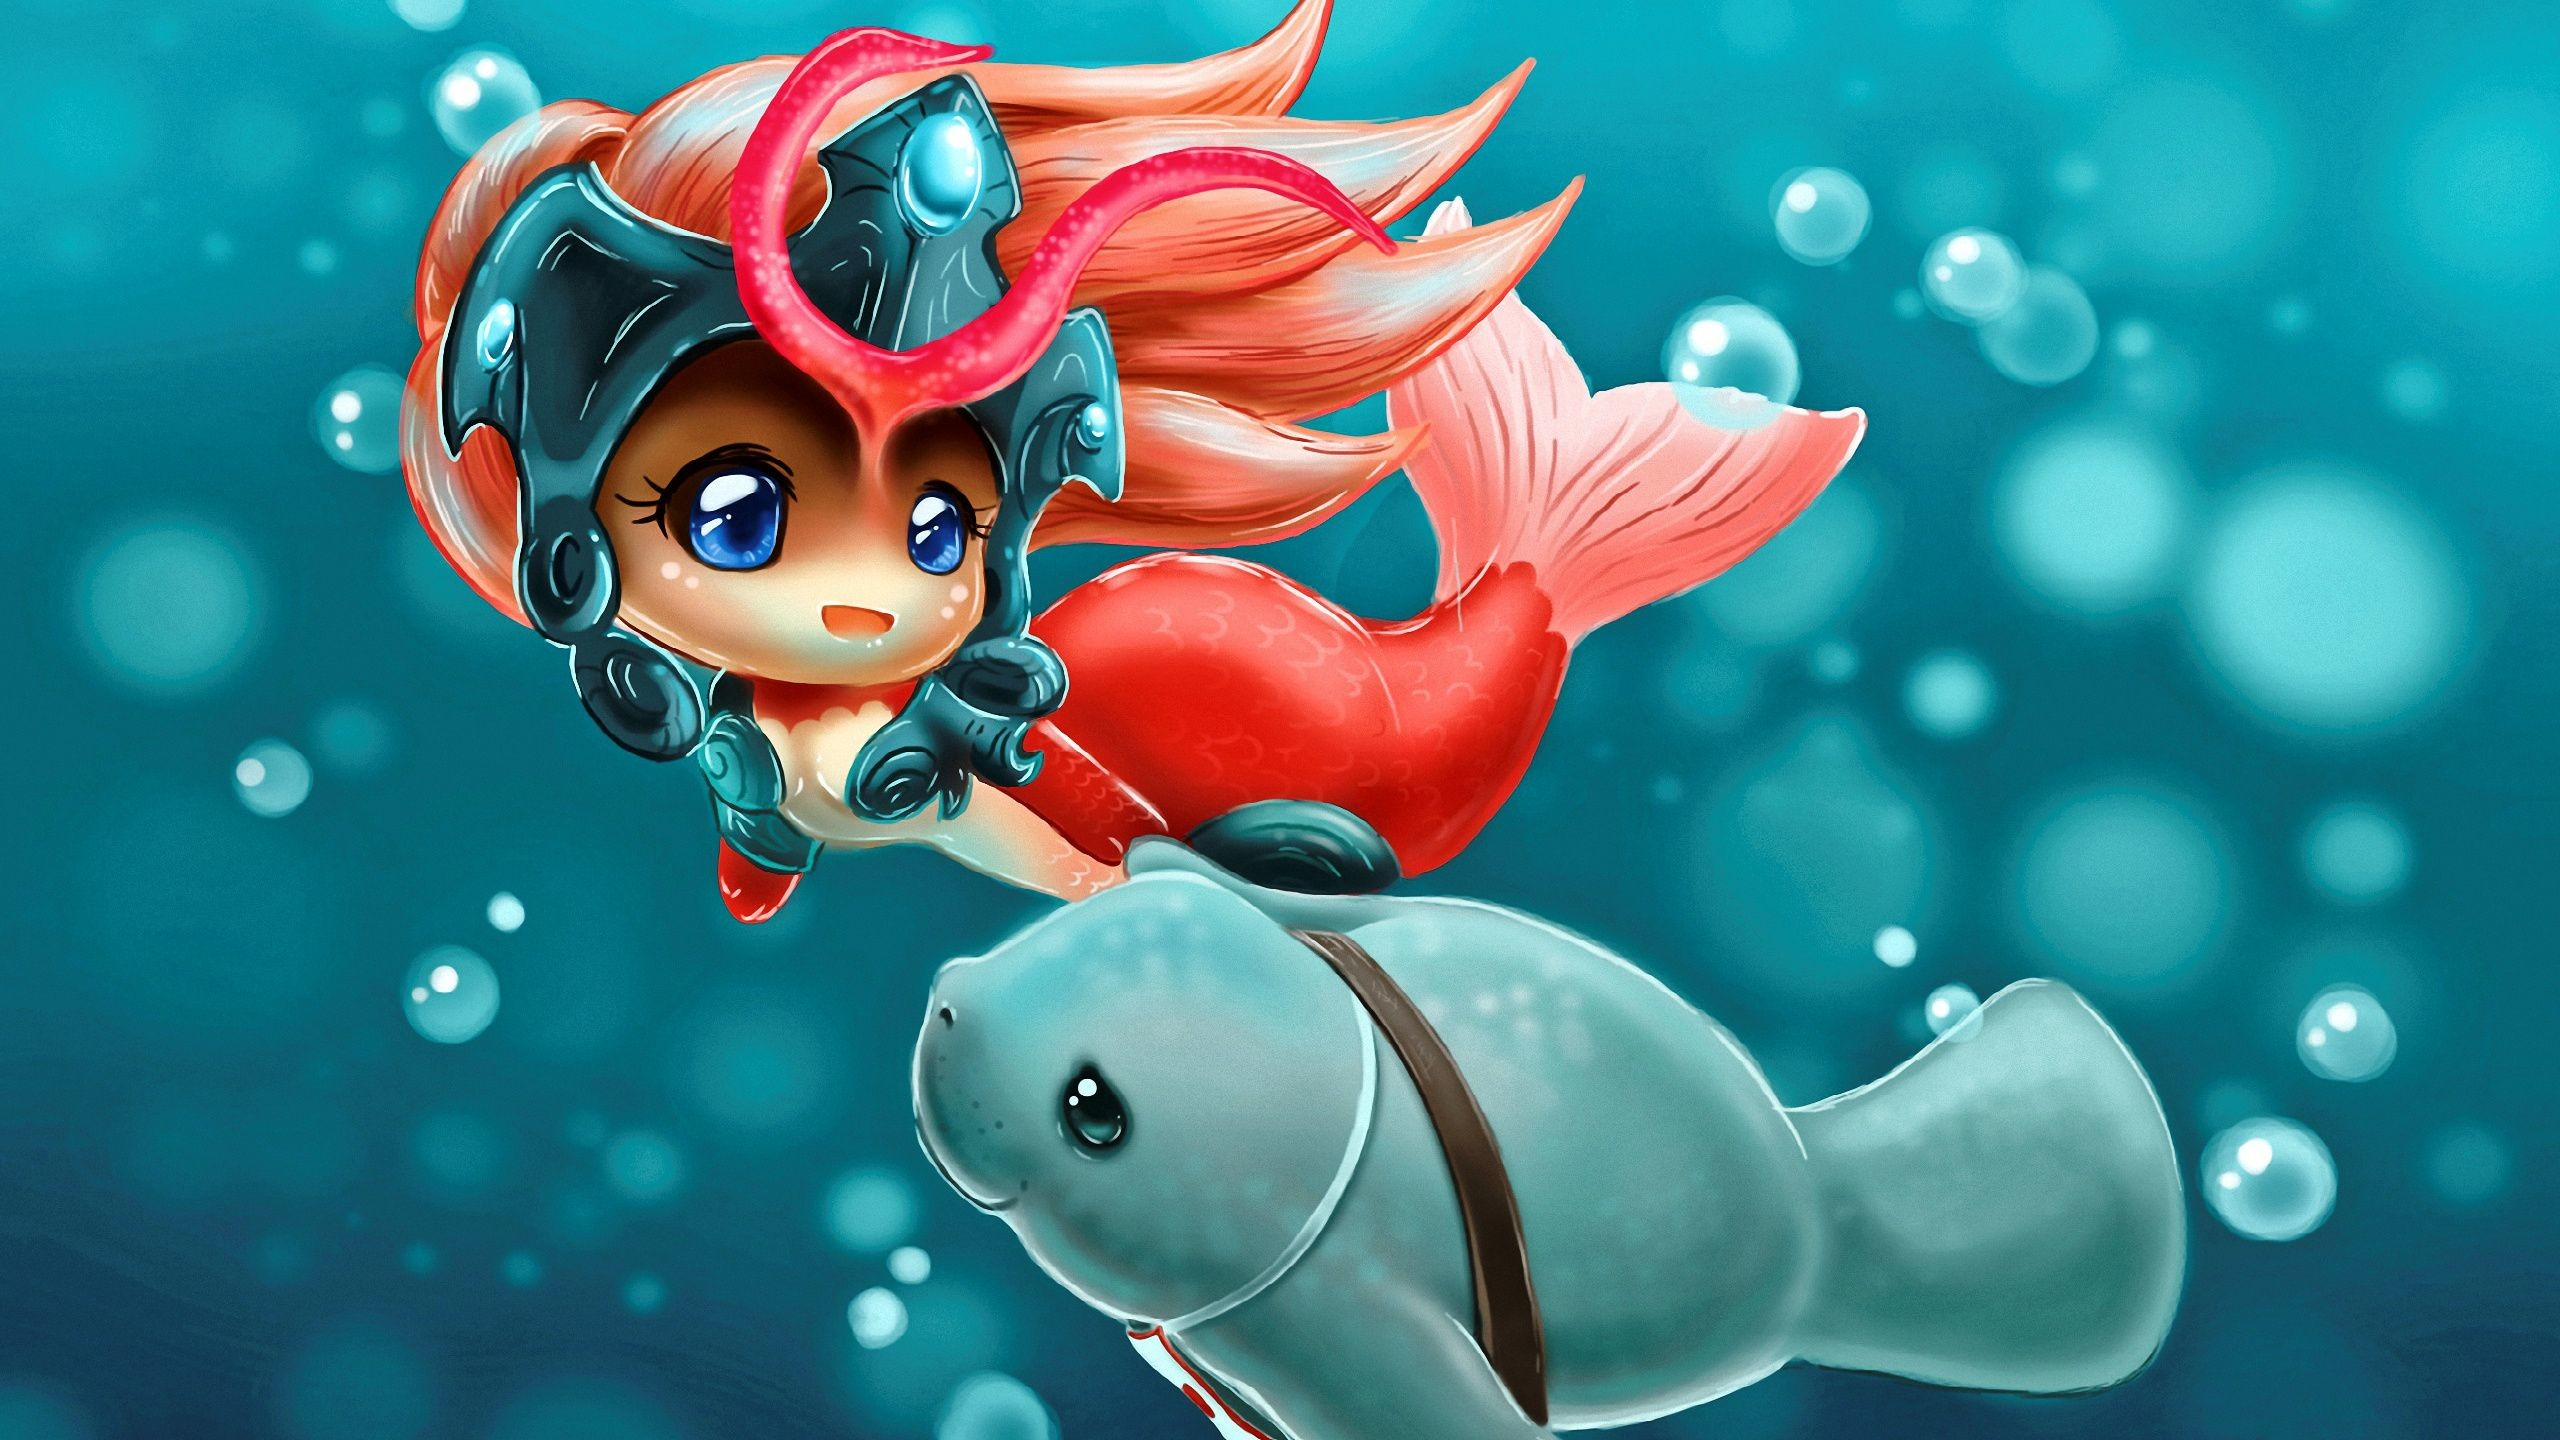 Res: 2560x1440, Computerspiel League Of Legends Nami Mermaid Anime Urf Wallpaper